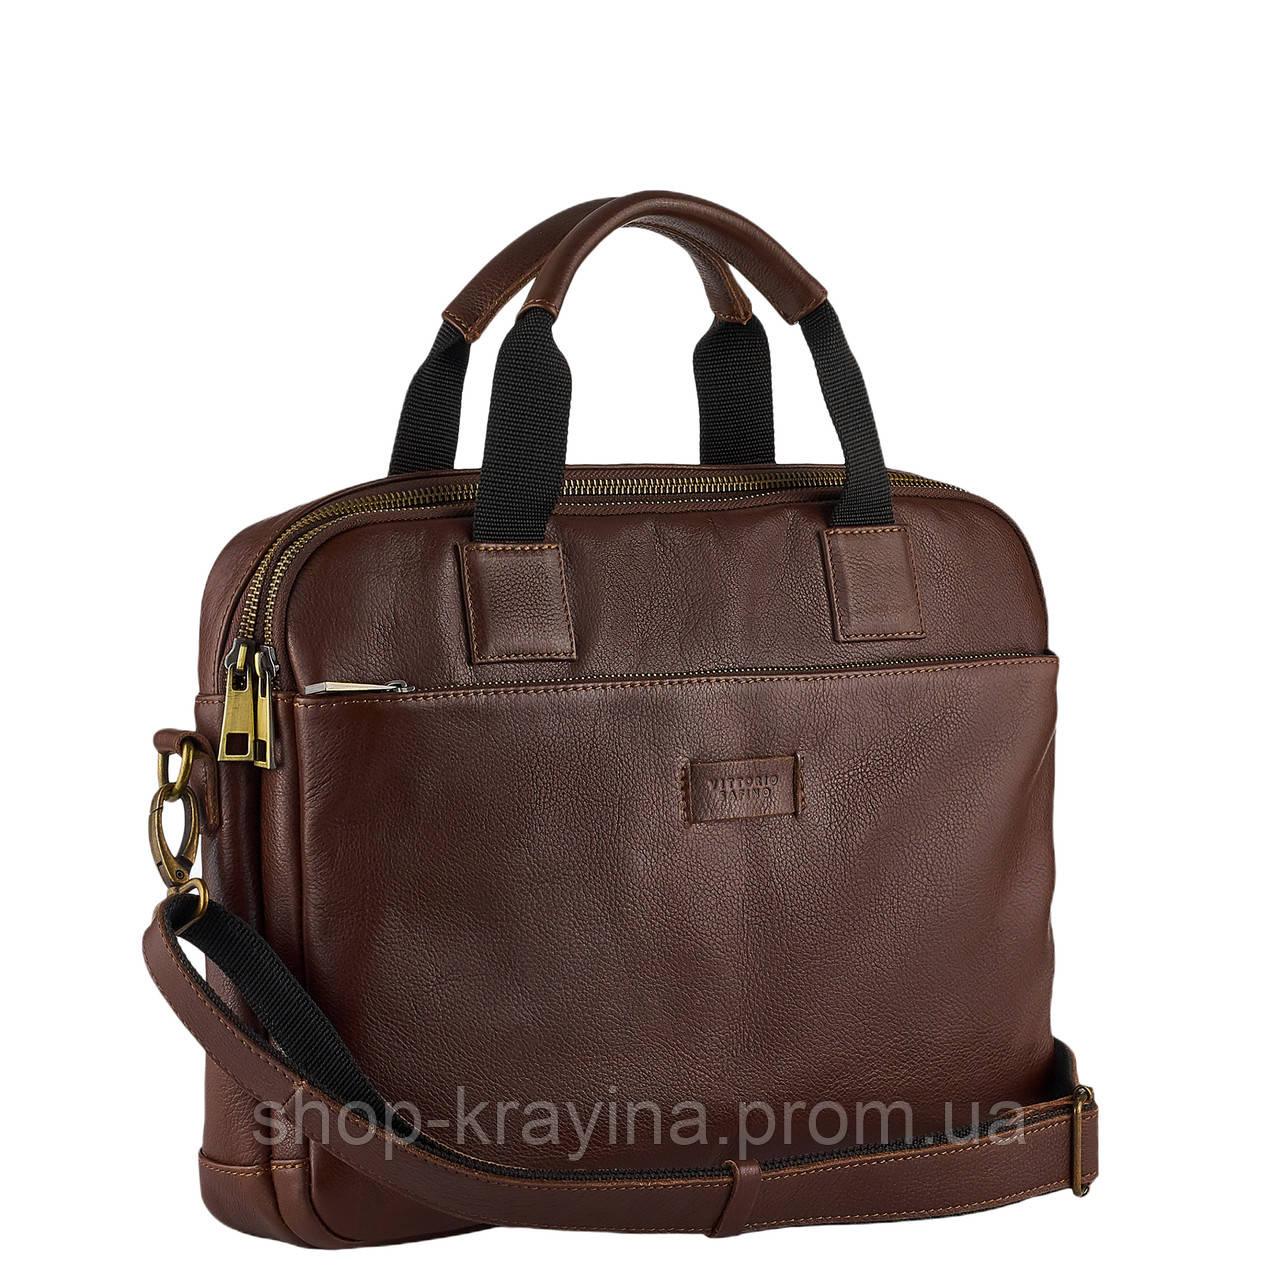 Сумка портфель из натуральной кожи Конг VS008 dark brown, 34х25х8